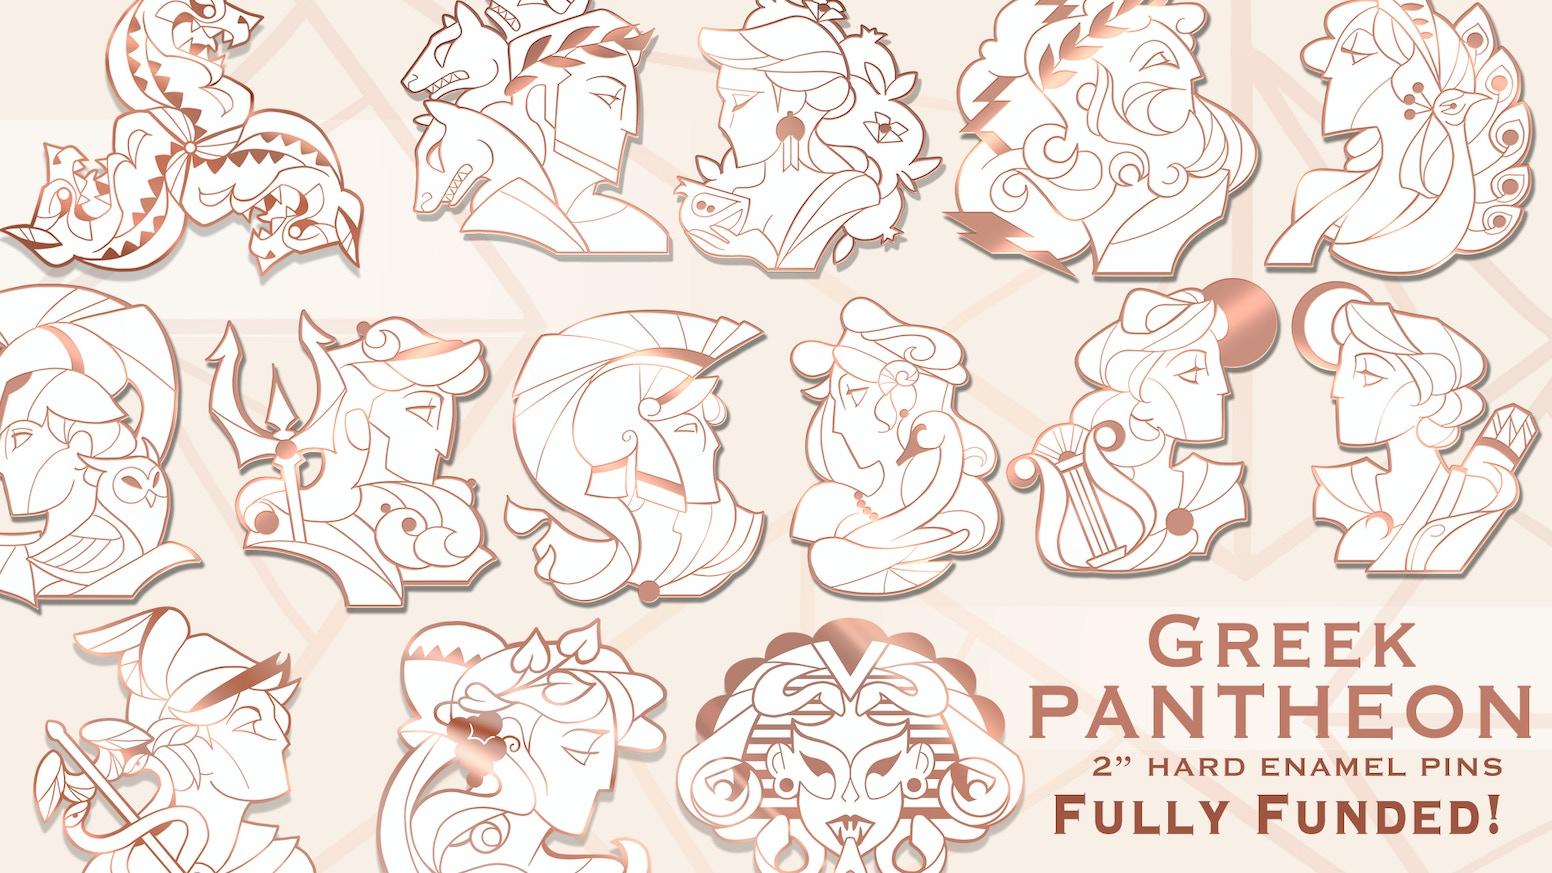 Greek Pantheon Hard Enamel pins by Triangle Art — Kickstarter